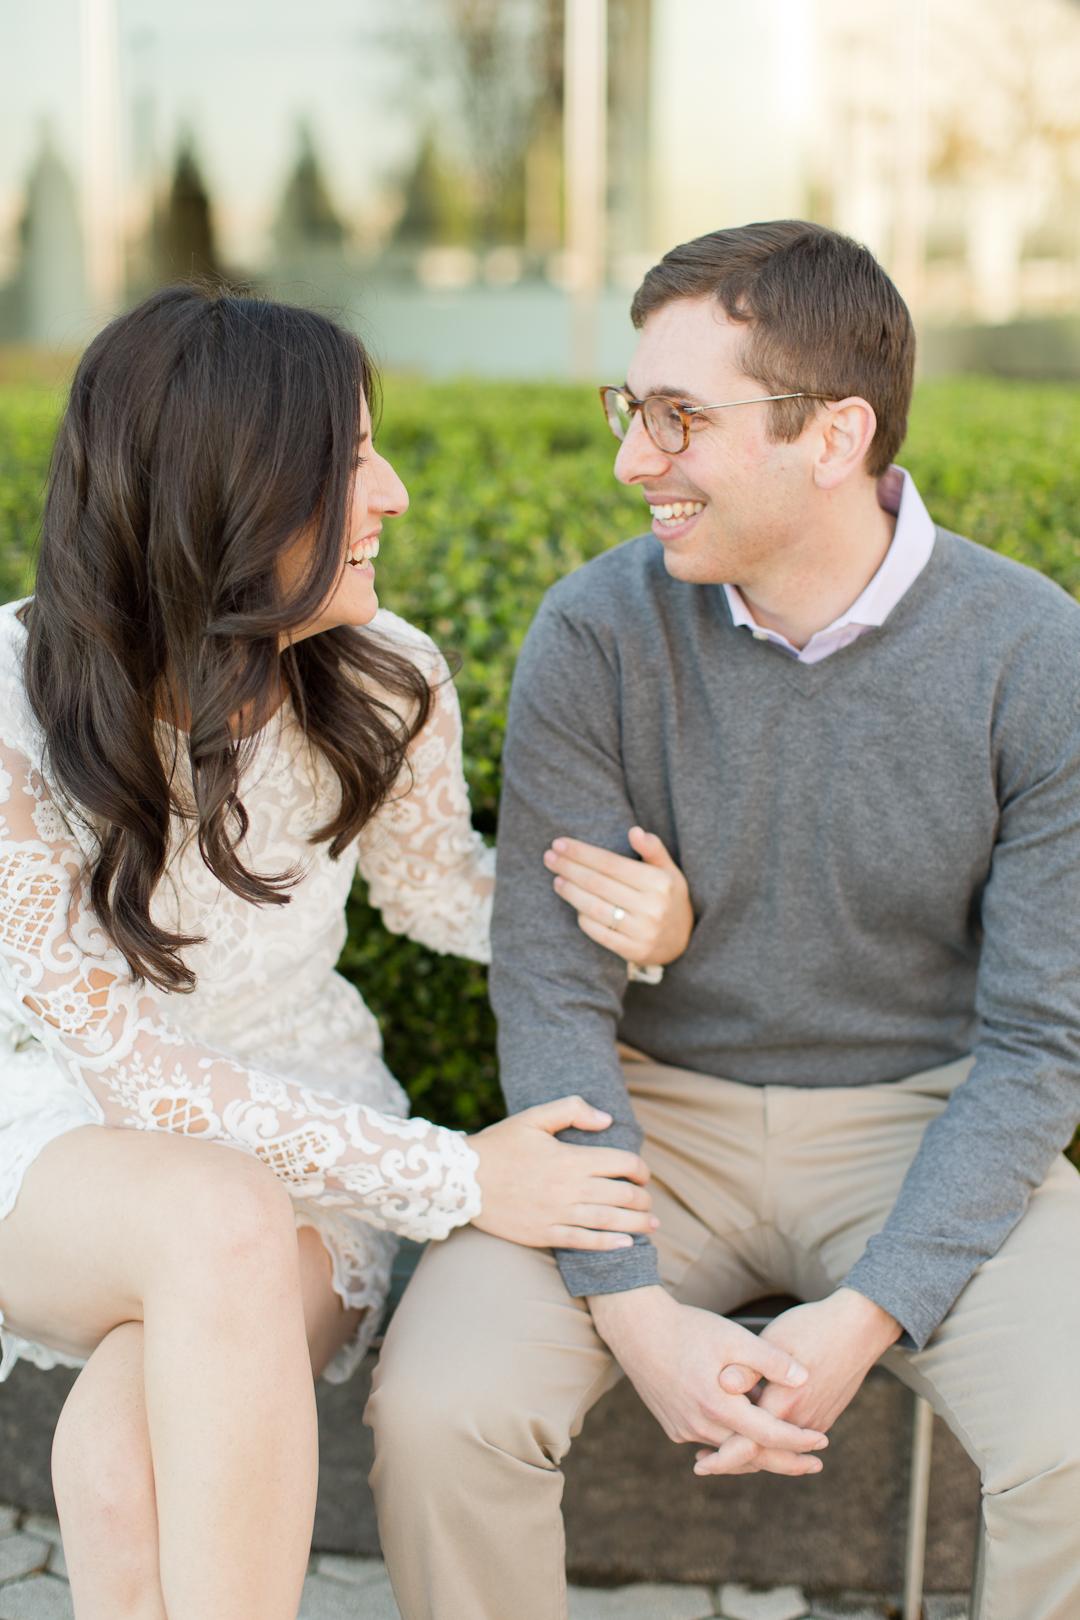 Melissa Kruse Photography - Christina & Alex Kips Bay Engagement Photos-33.jpg